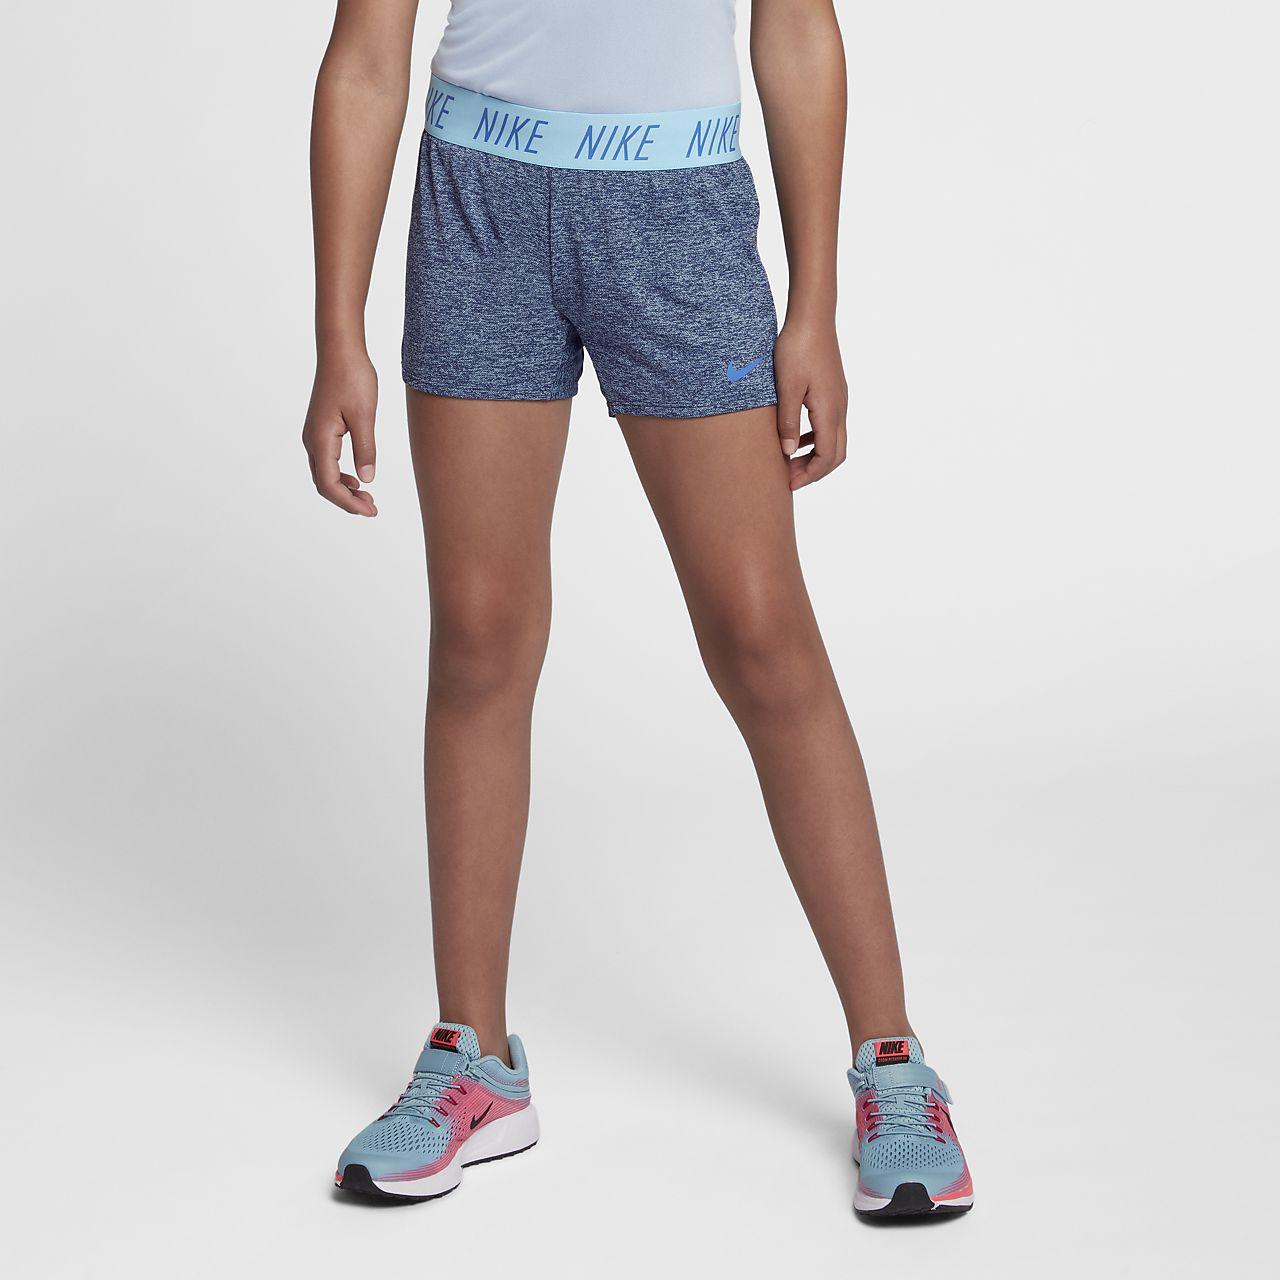 7ab364b6516 Nike Dri-FIT Trophy Older Kids  (Girls ) Training Shorts. Nike.com CH